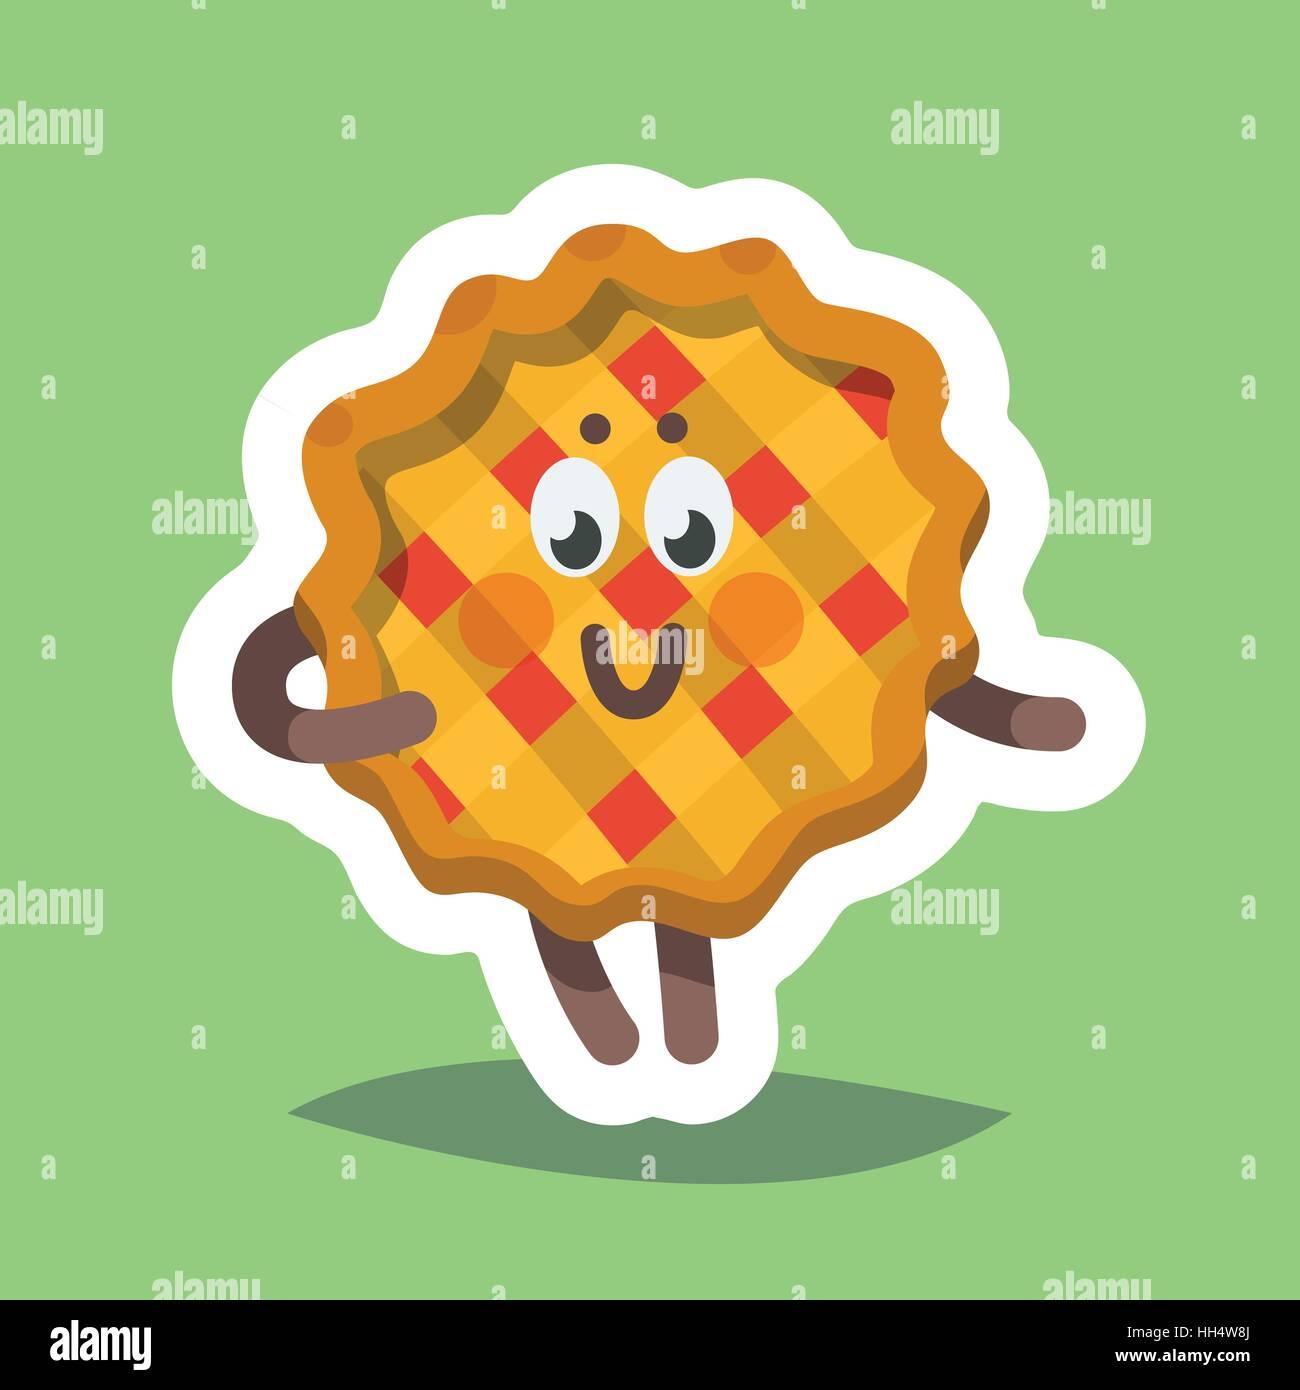 Vektor Illustration Emoticon Emoji Icon Thema Herbstferien Herbst